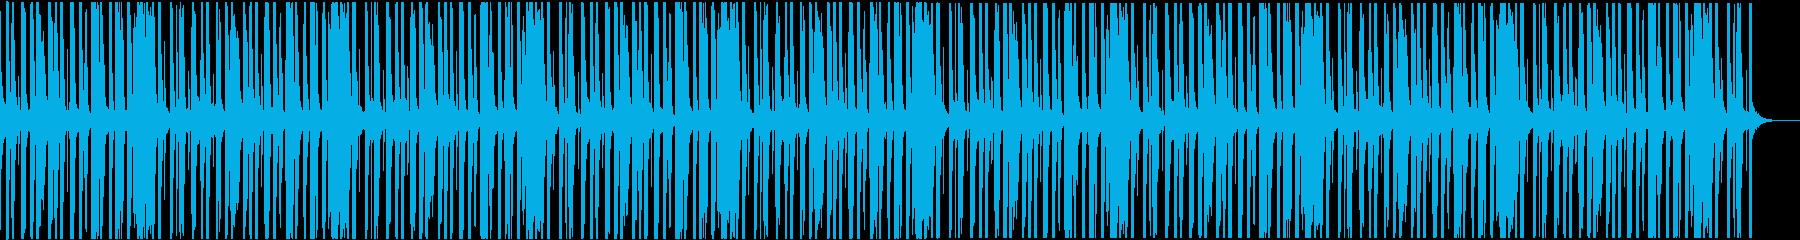 youtube漫画・探偵・調査・ピアノの再生済みの波形